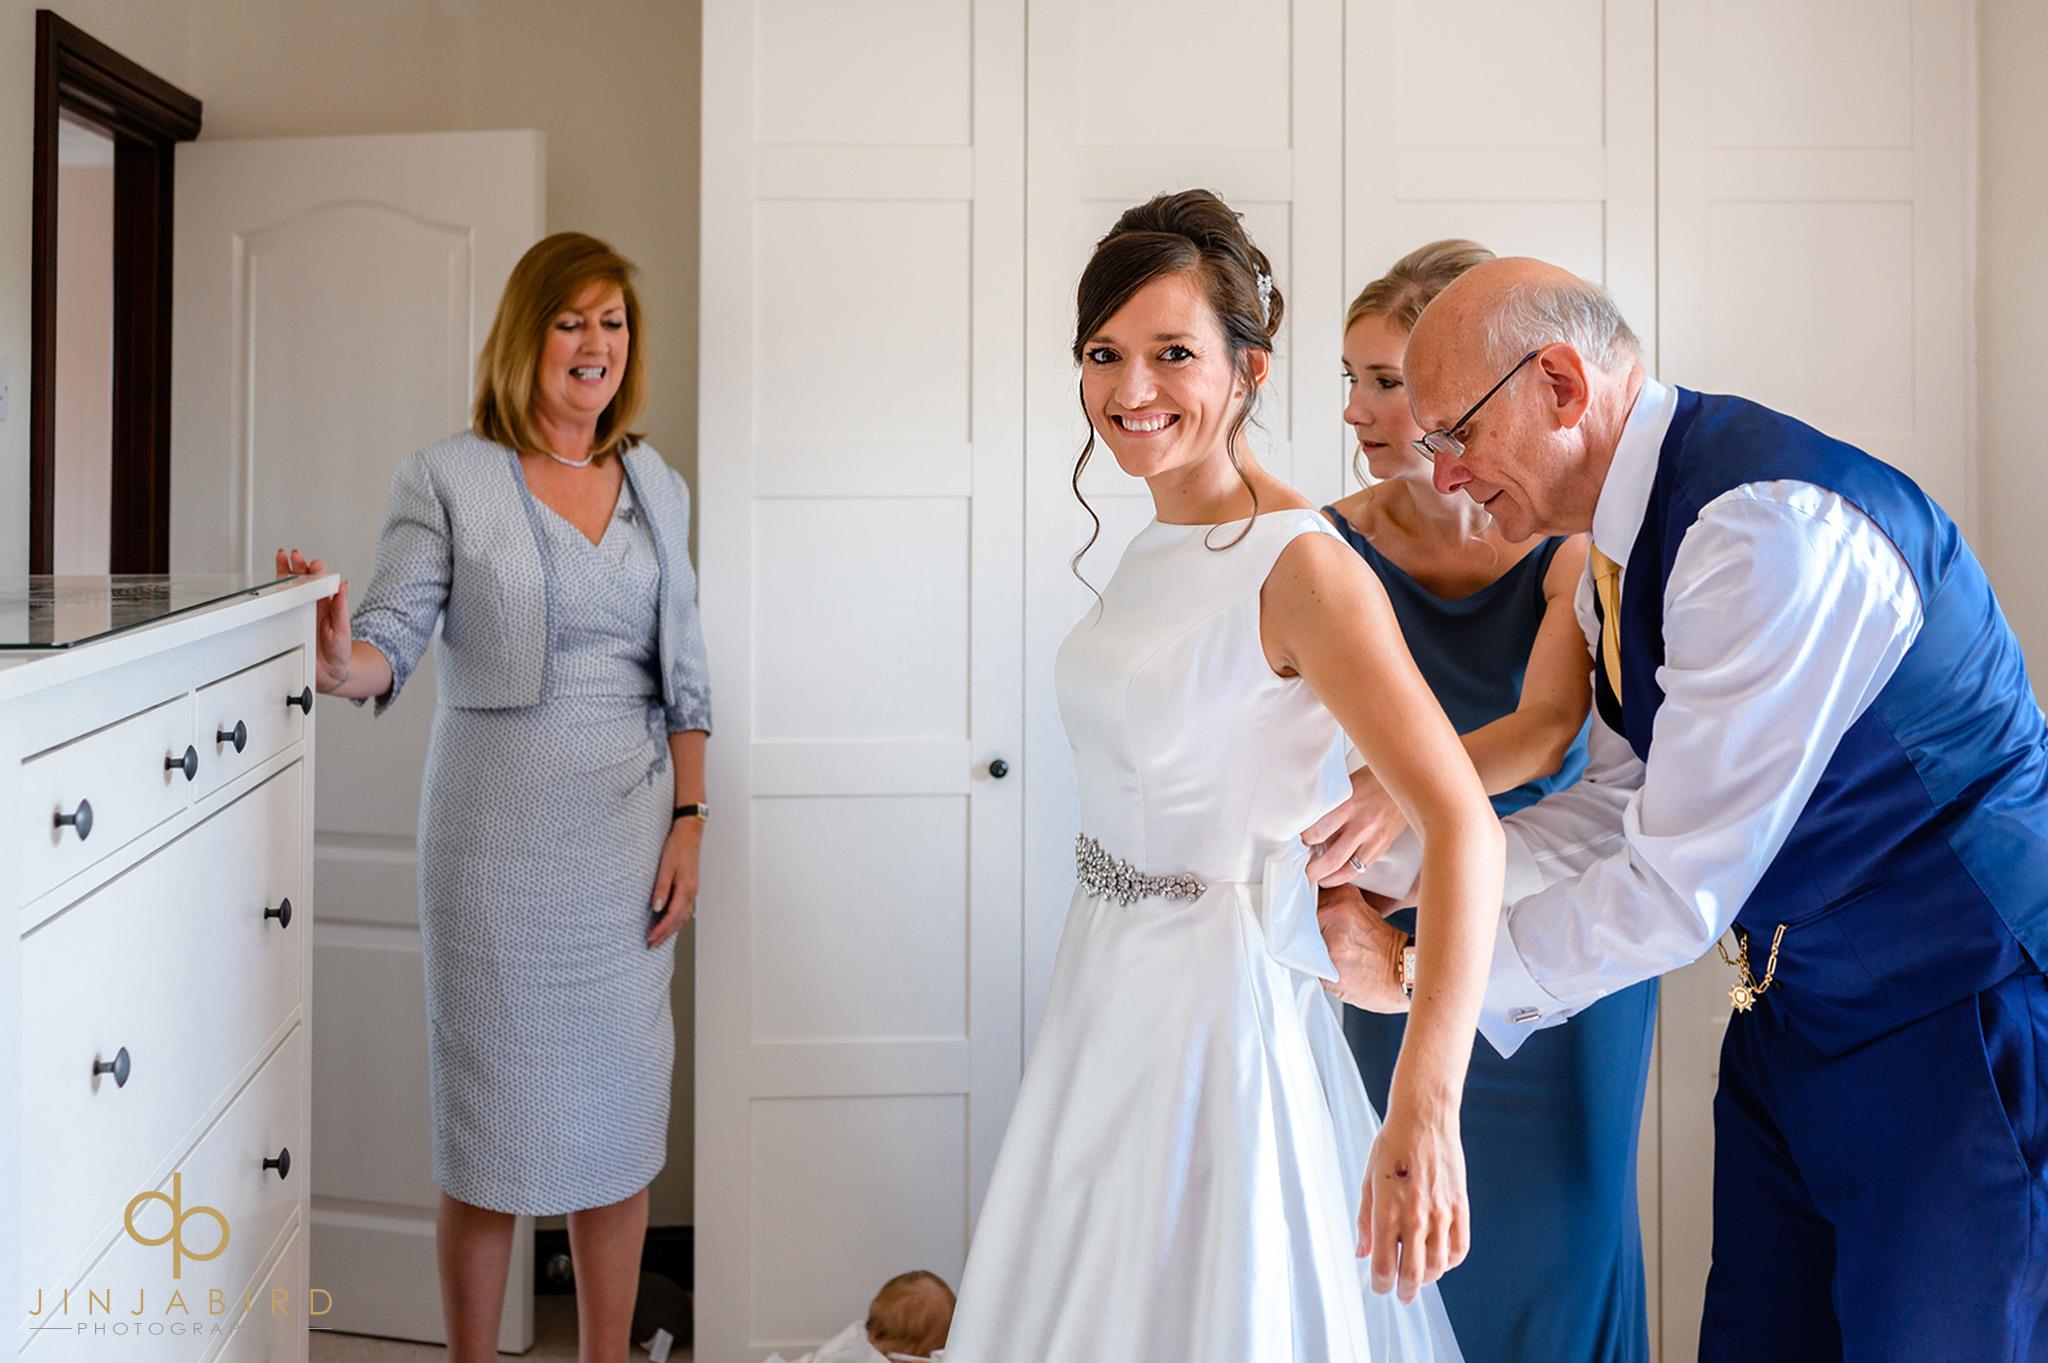 brides dad helping with wedding dress